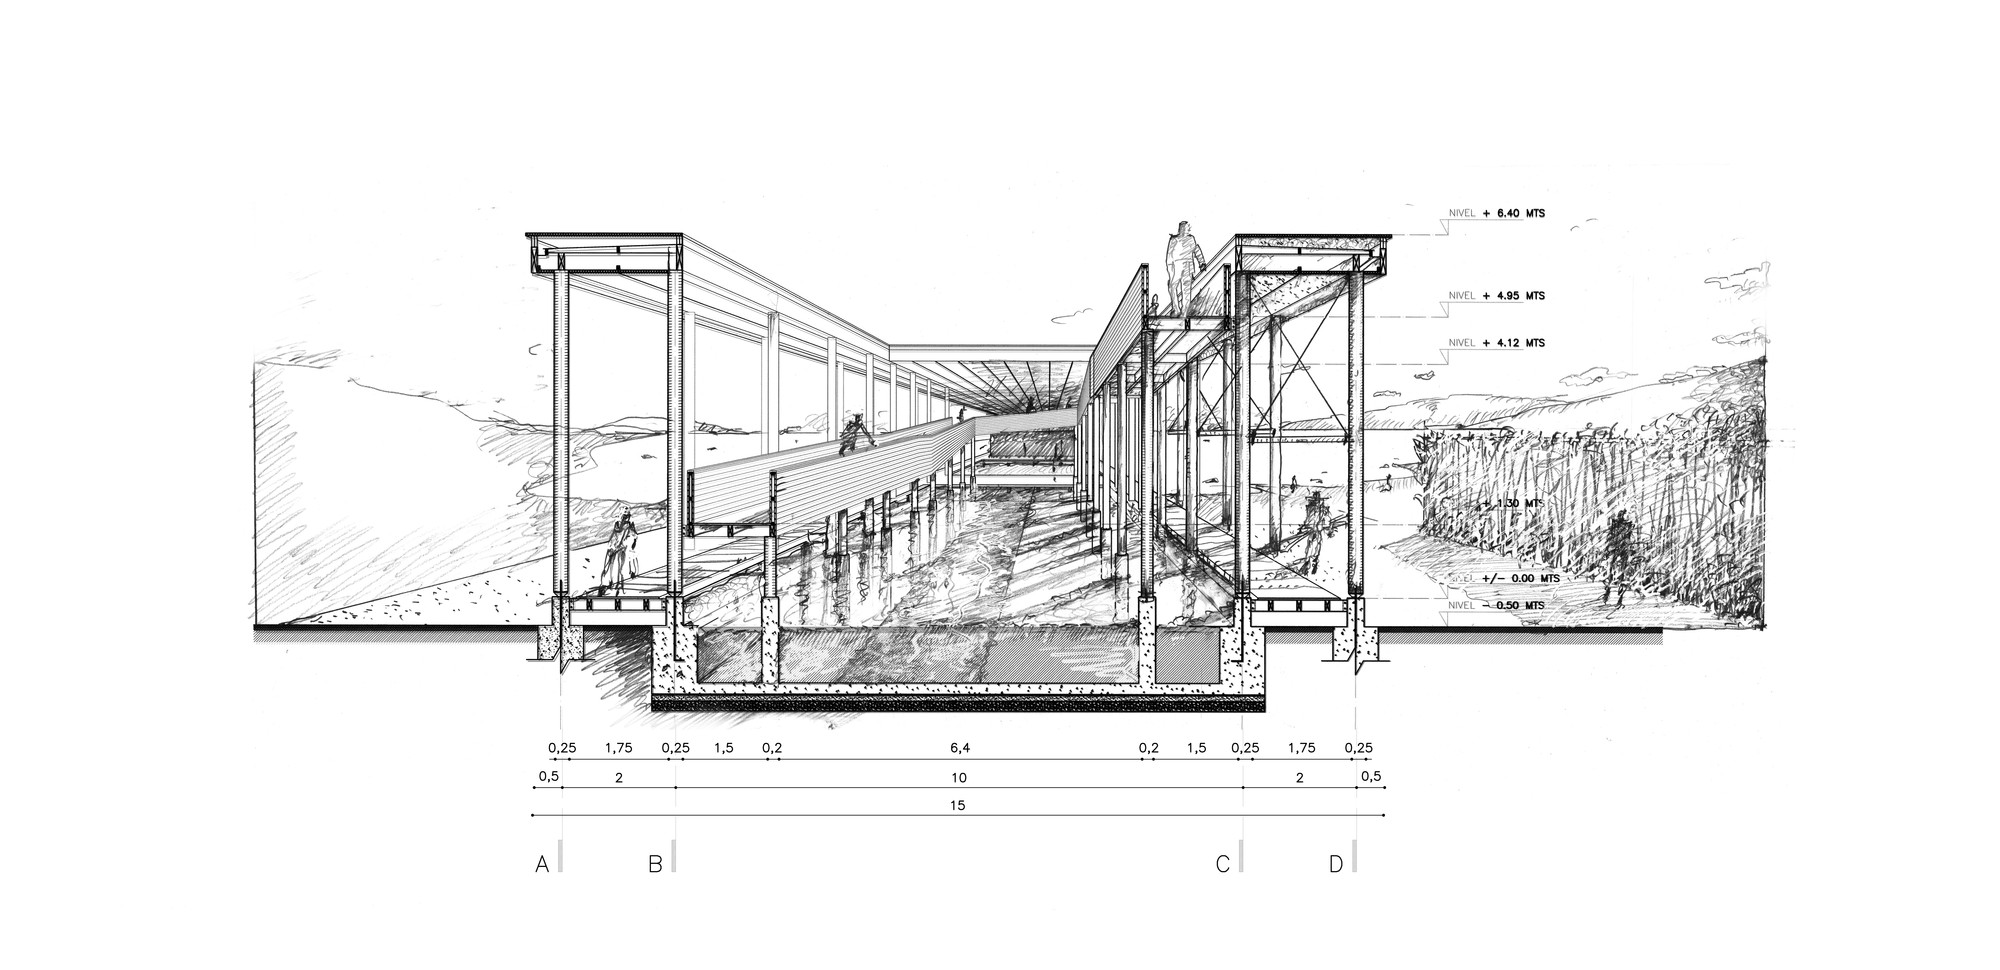 Muelle de Mimbre, un proyecto de rescate patrimonial, Cortesia de Domingo Arancibia